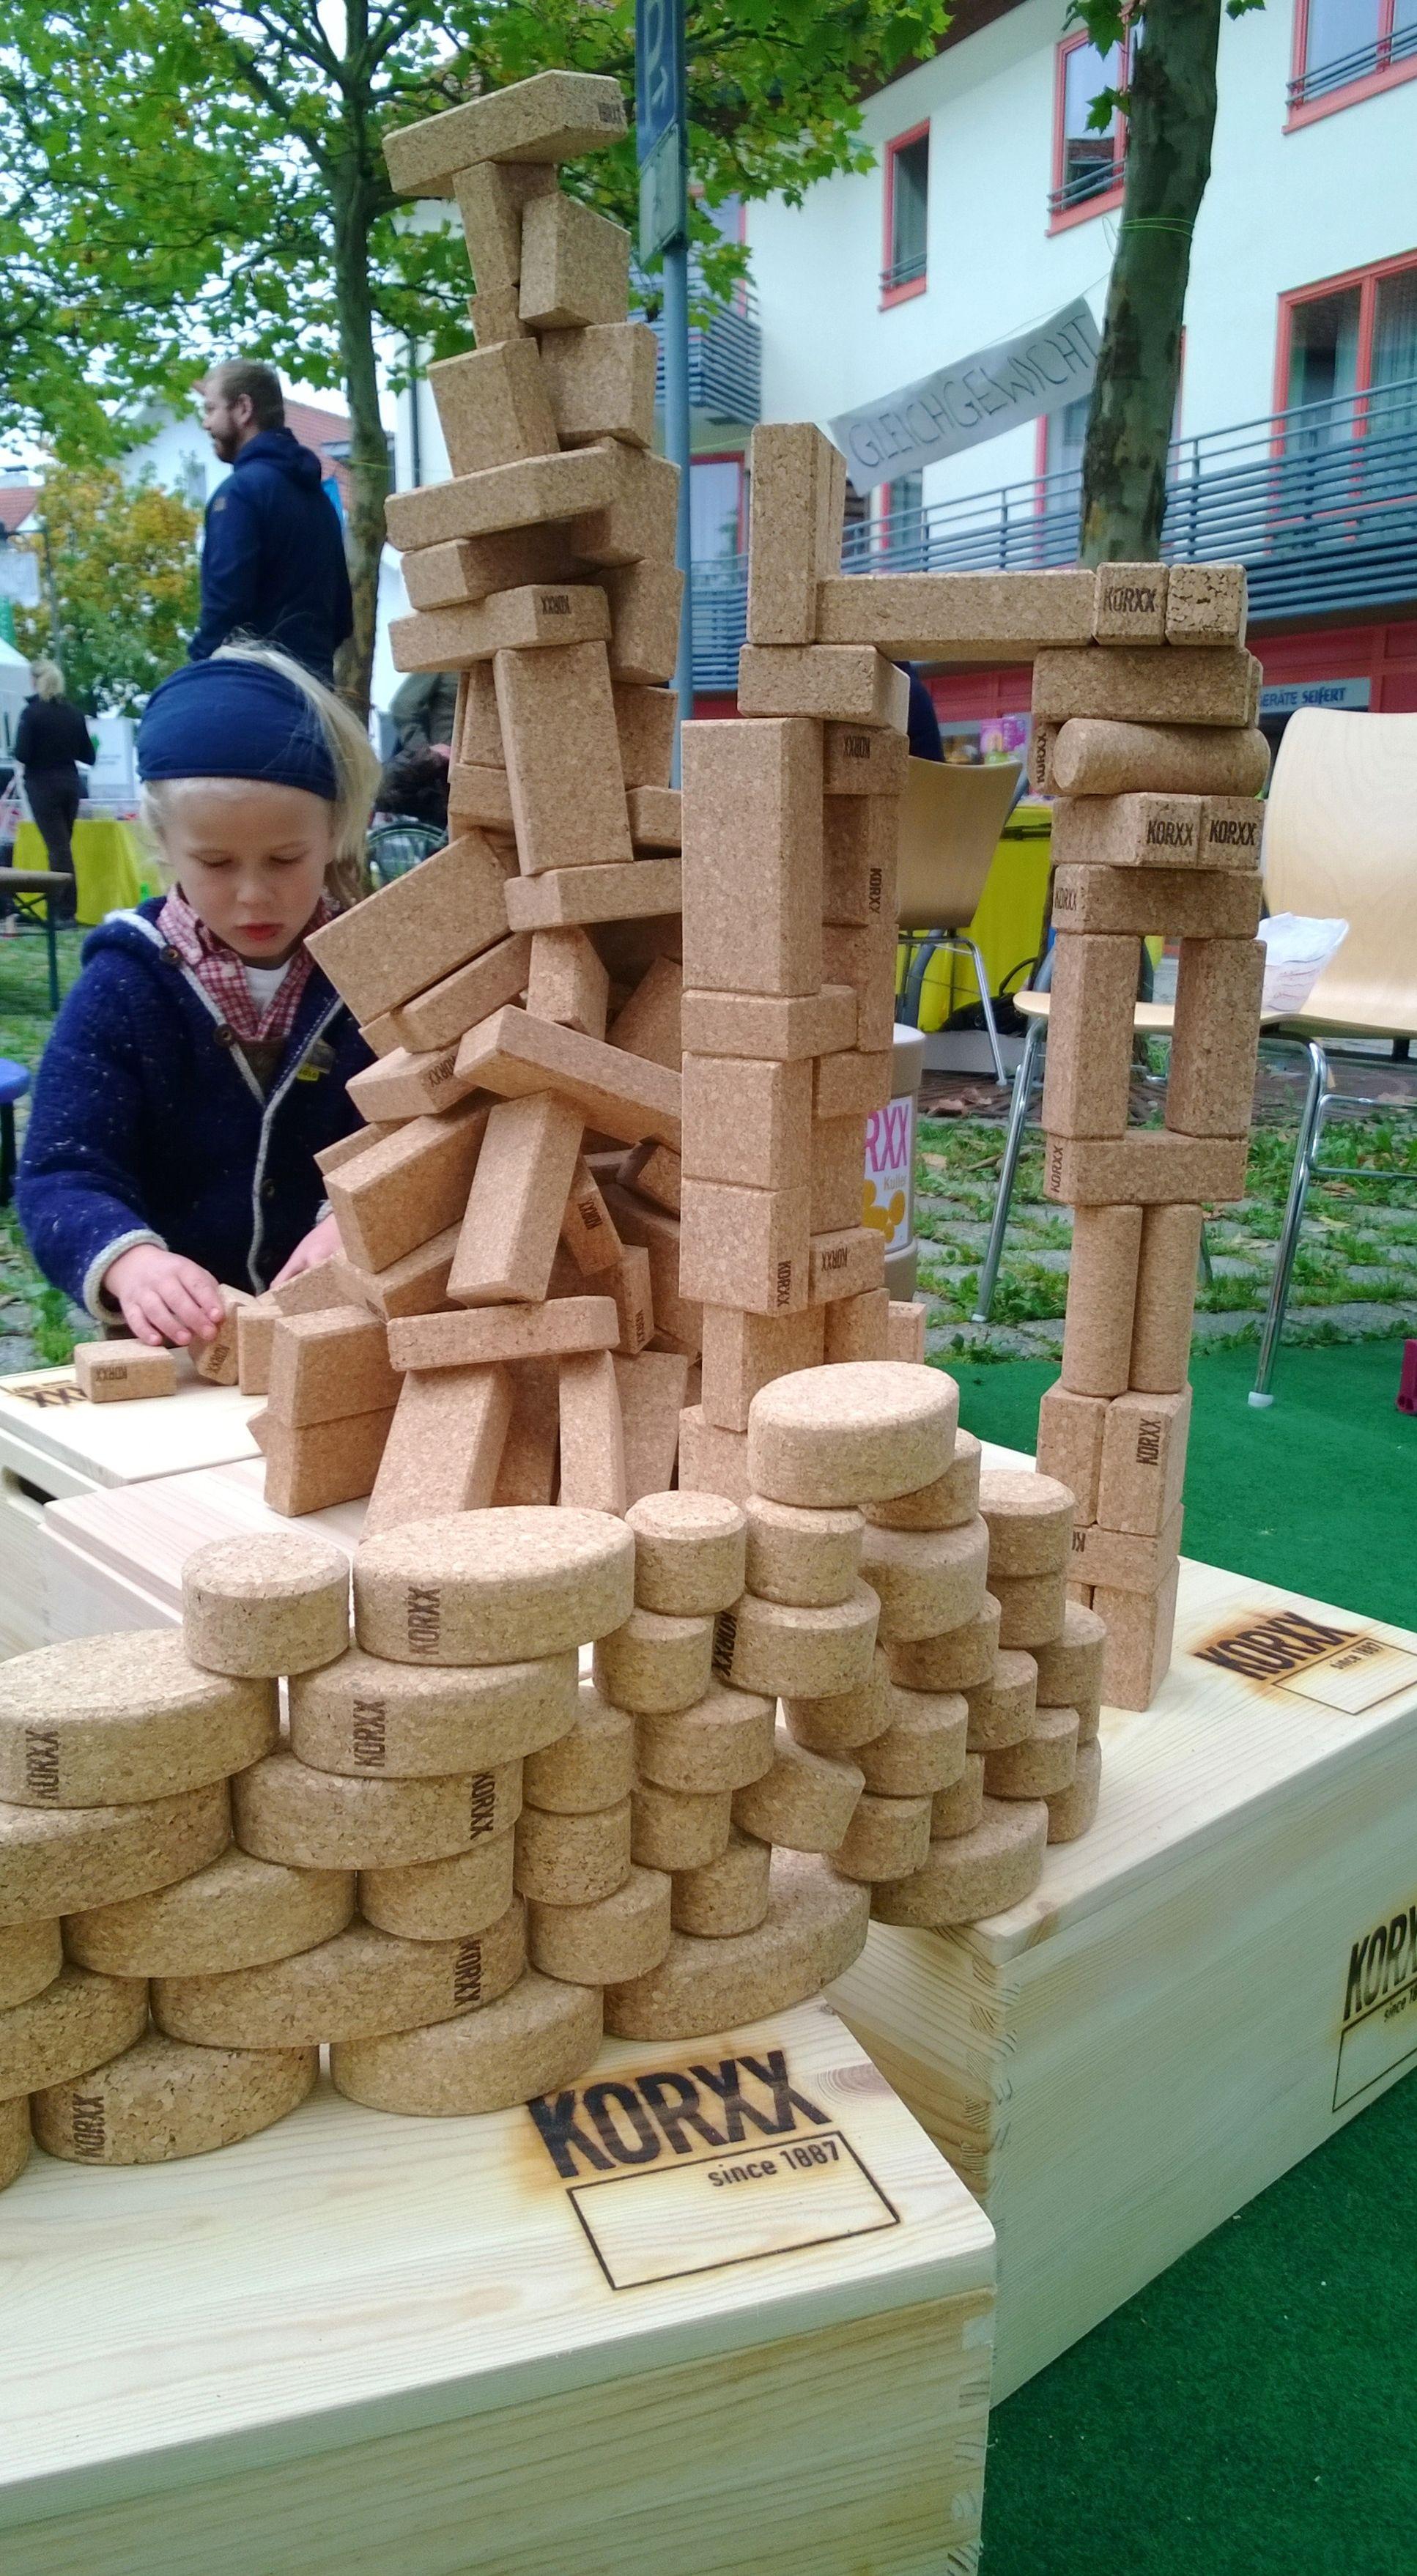 KORXX Outdoor Play - cork building blocks | Block area ...